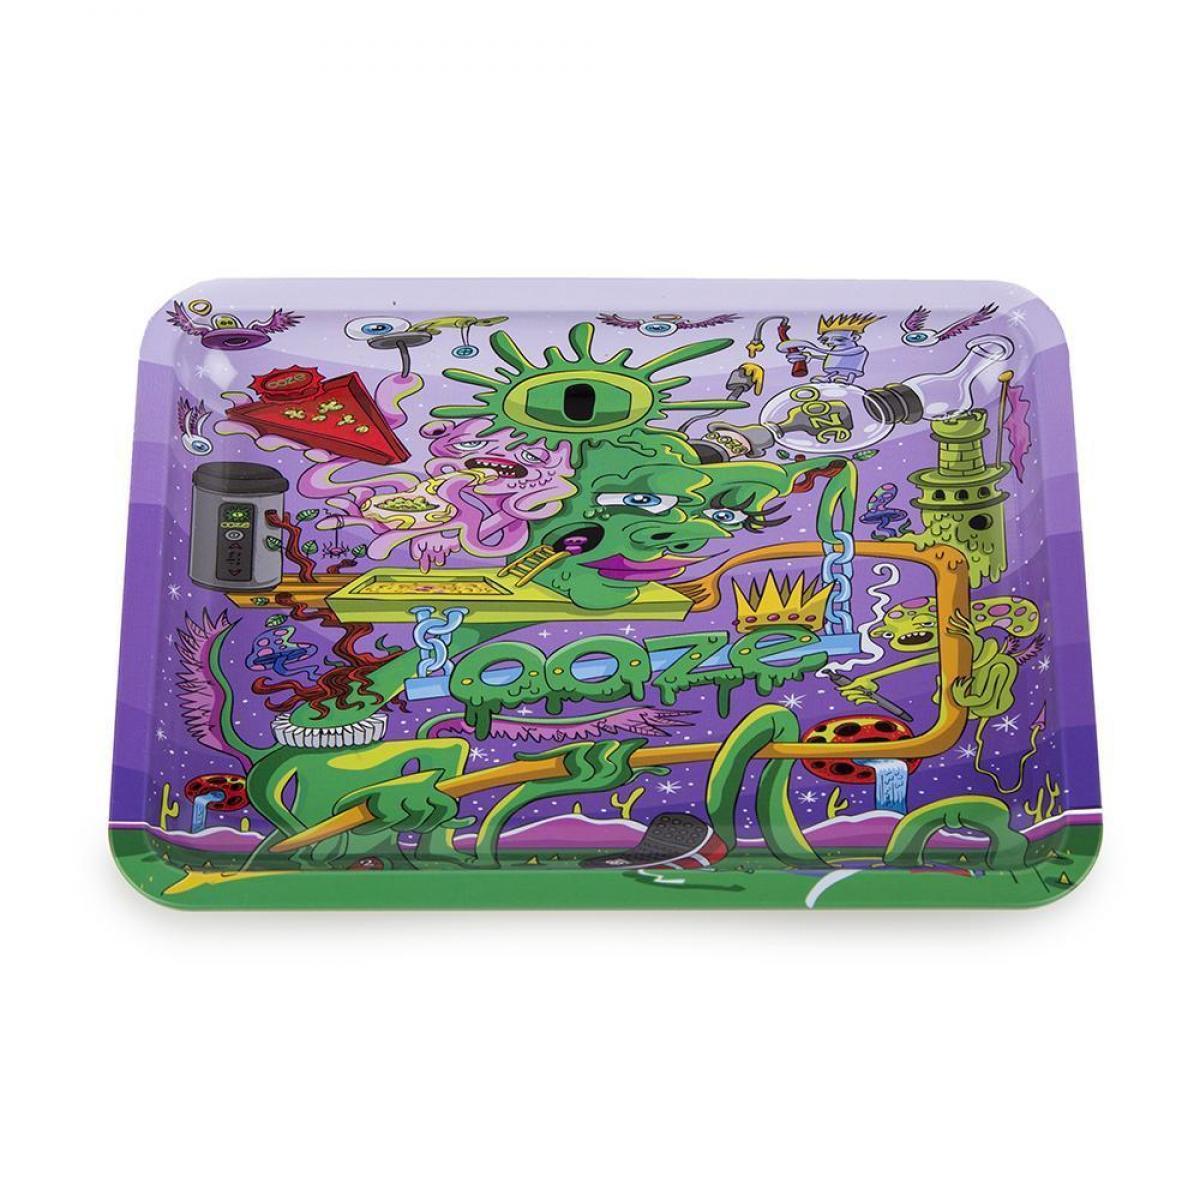 Ooze Rolling Tray - Purple Factory - SMALL